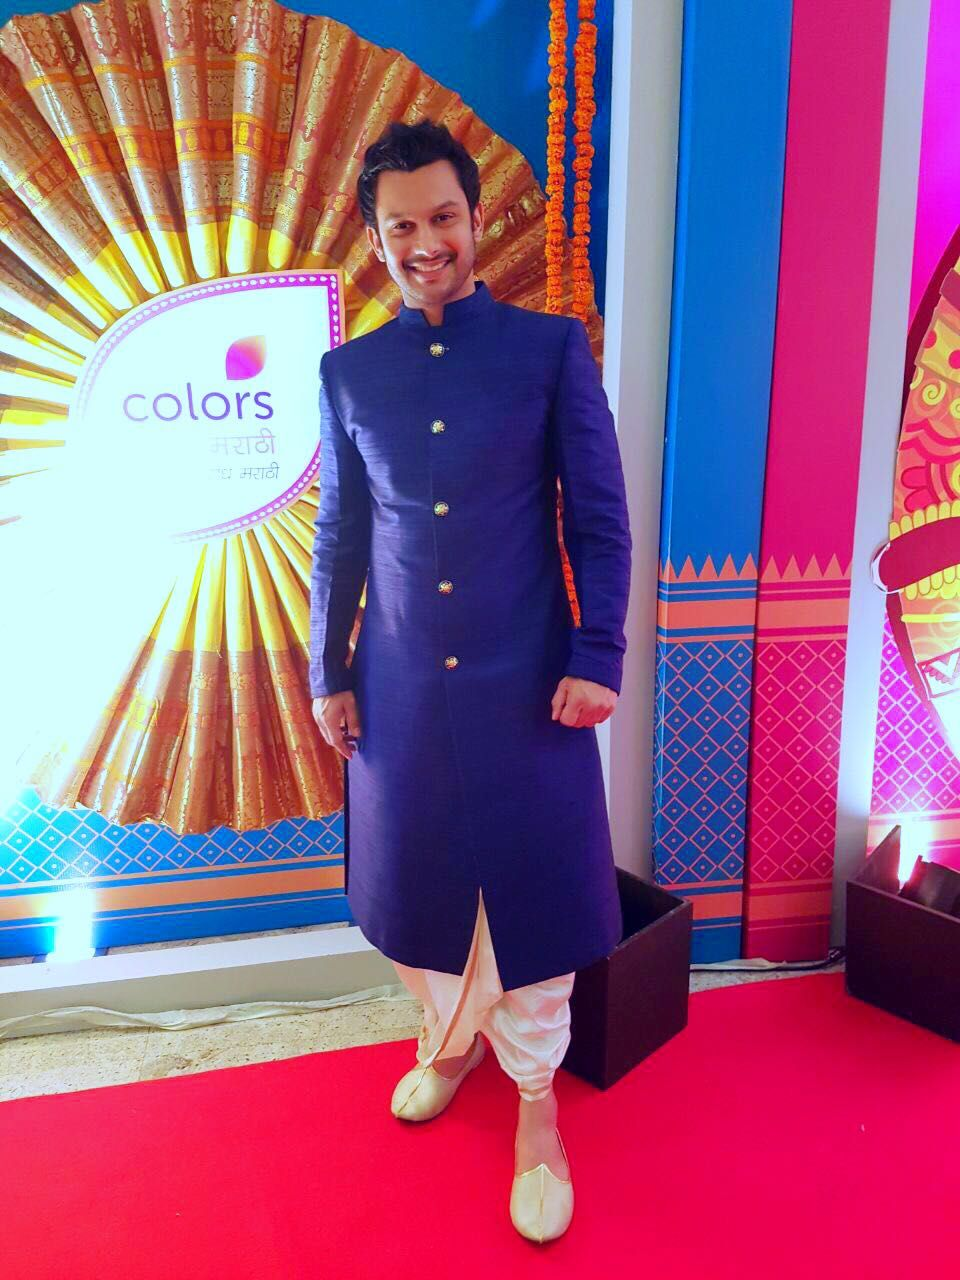 Actor Adinath Kothare in Bubber Couture's Blue rawsilk 'Maharao